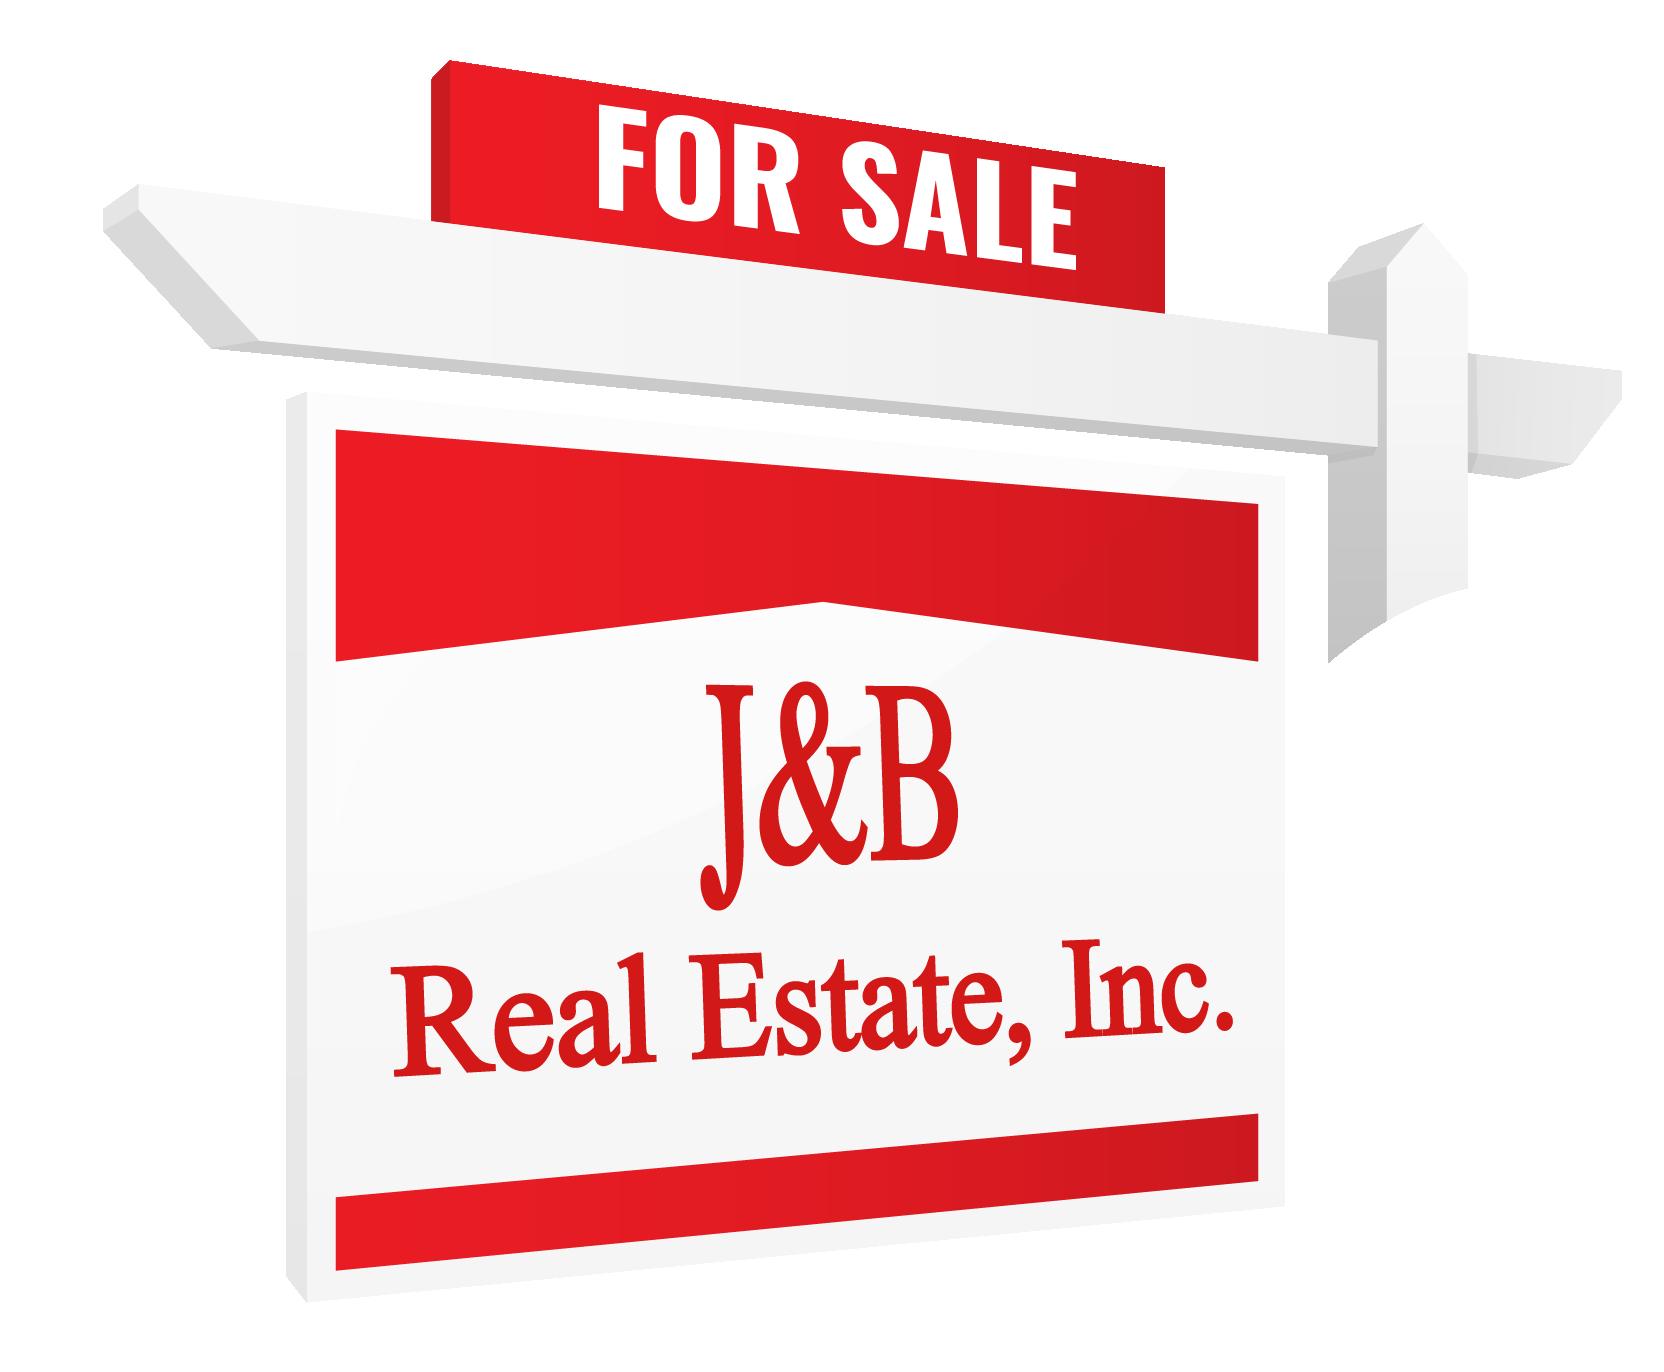 J&B Real Estate